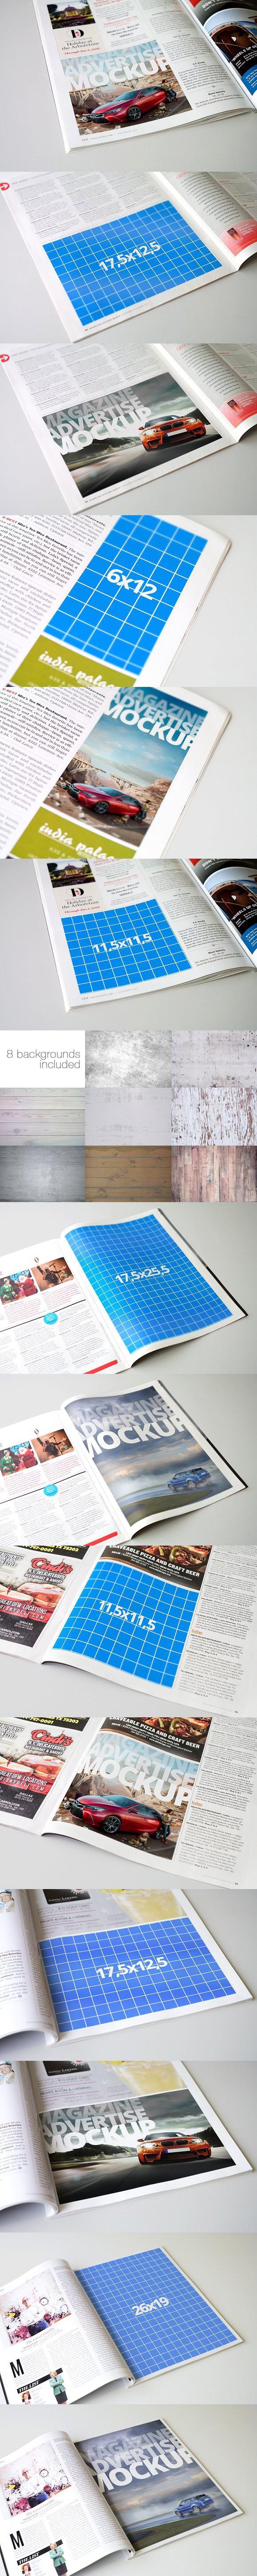 Magazine Advert Mockups. Photoshop Textures